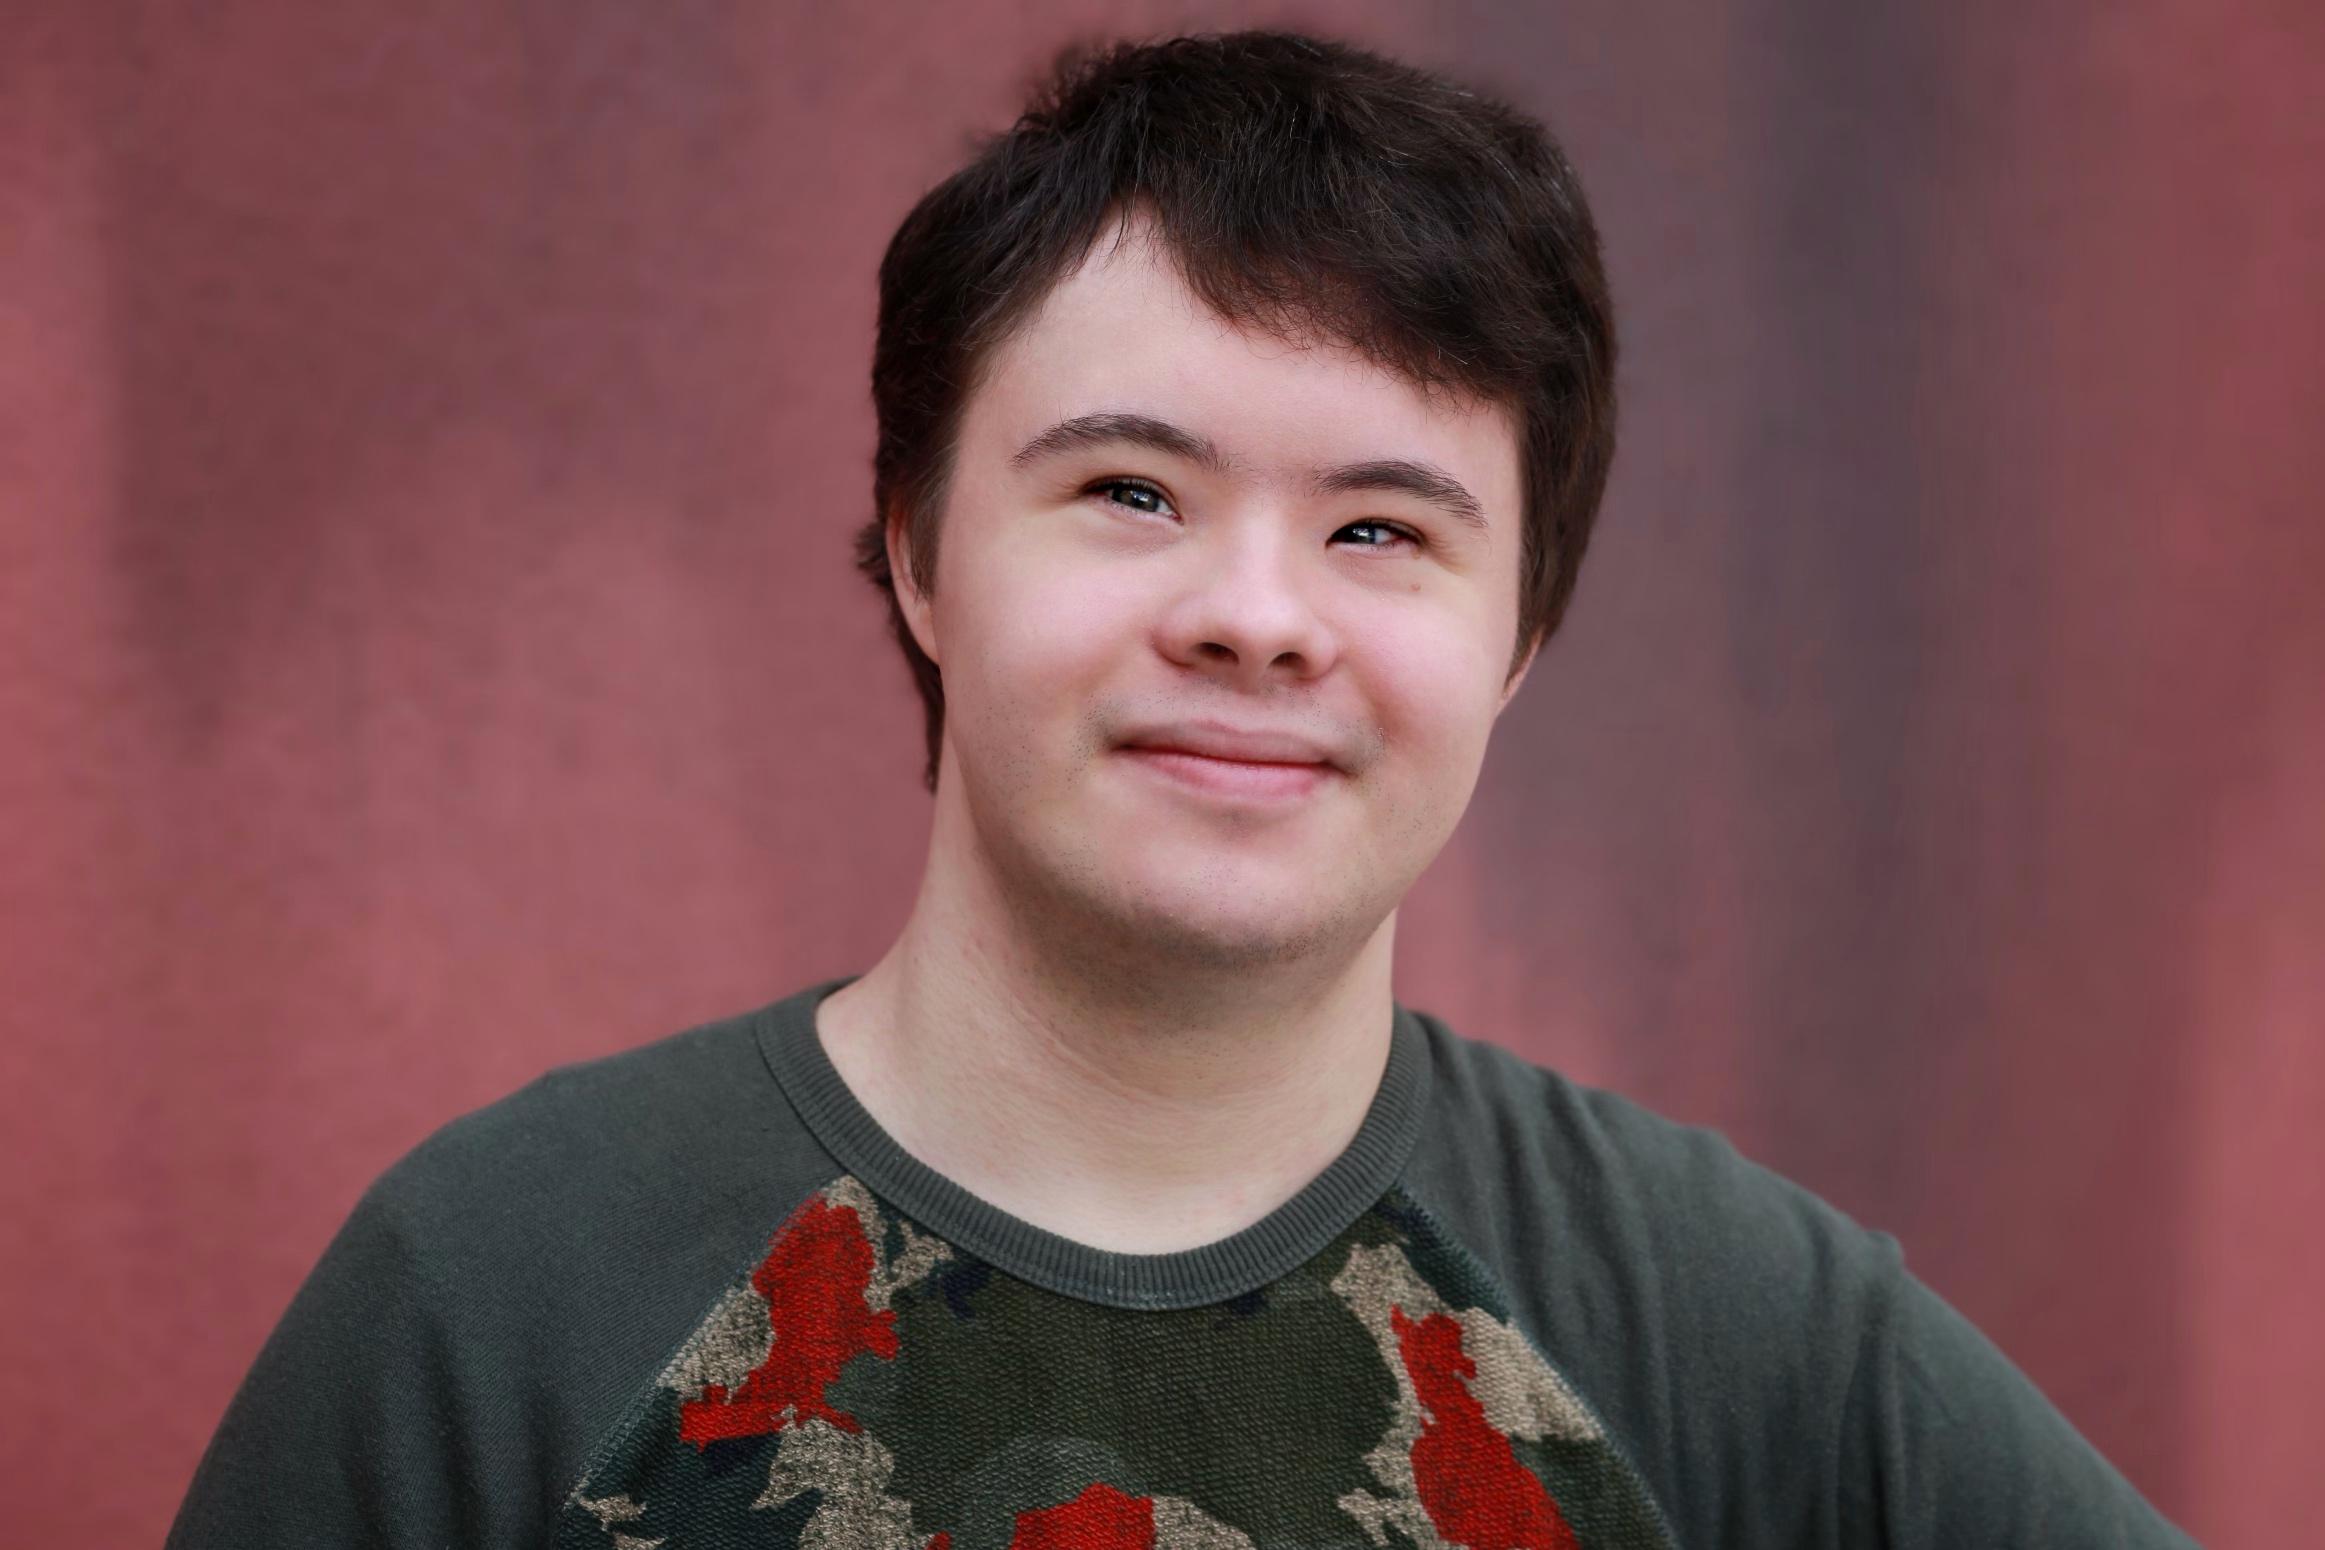 Emil, 23 Jahre. Fotografie: Kseniya Ibadulina